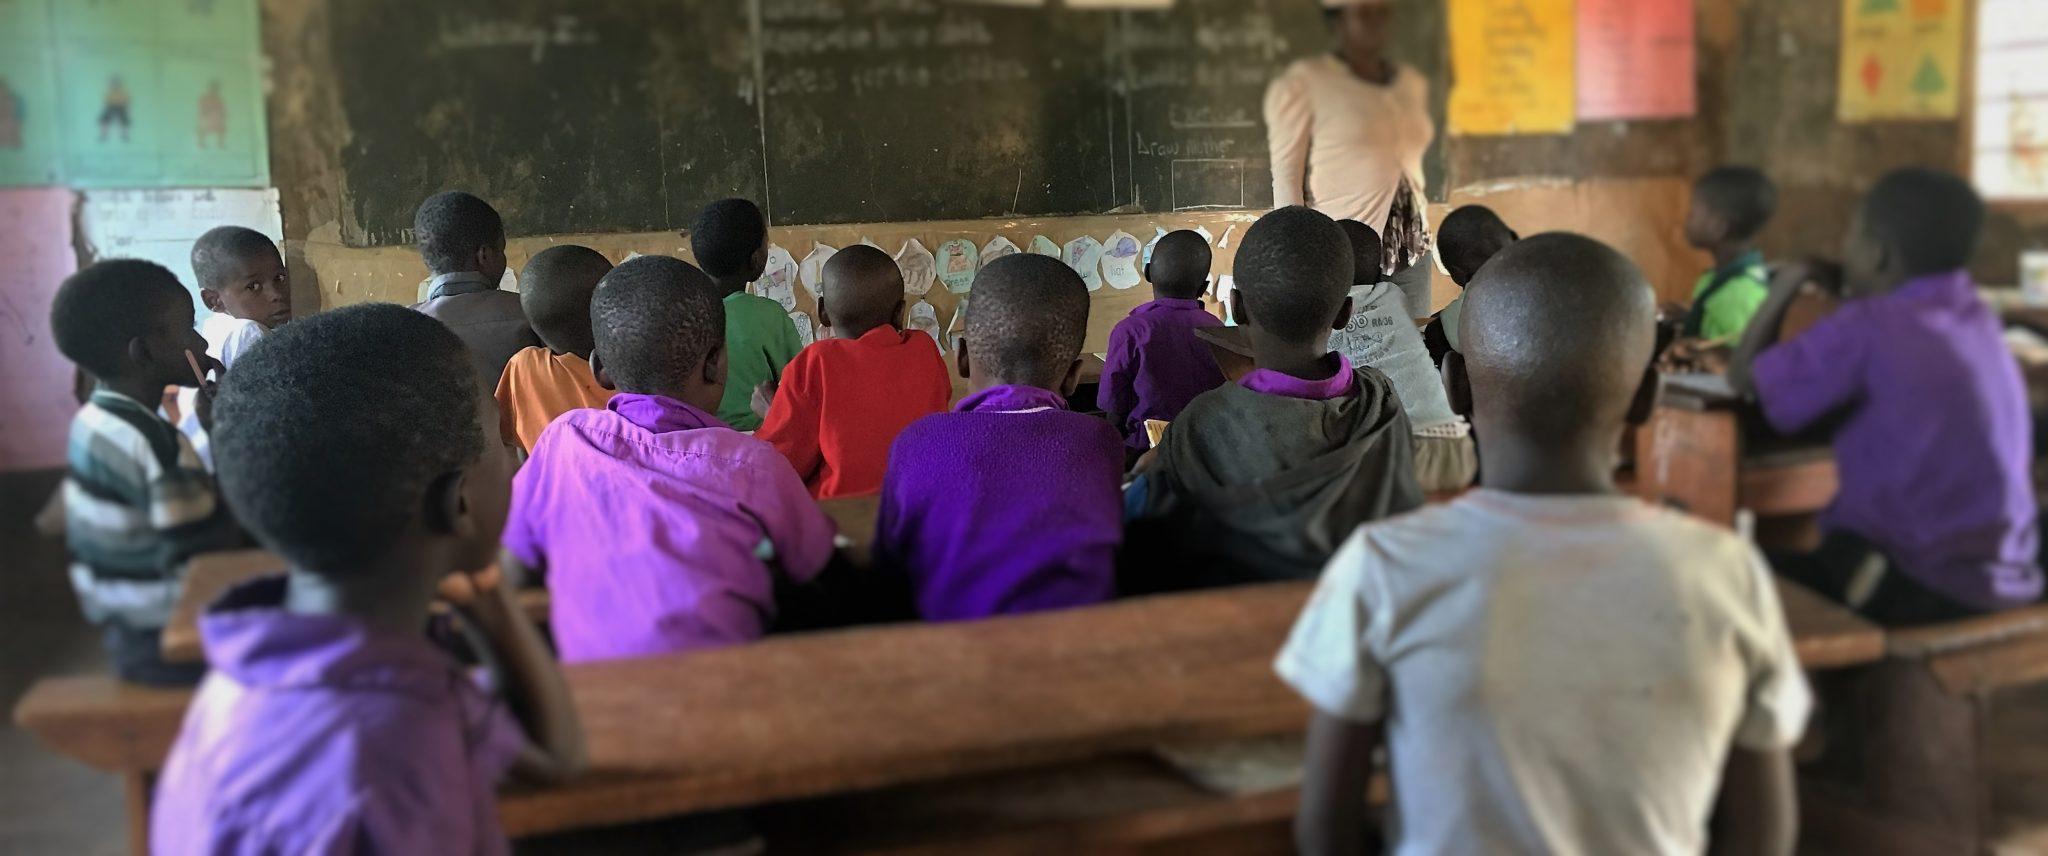 BUIKWE DISTRICT TEACHERS' FORUM – The Great Generation